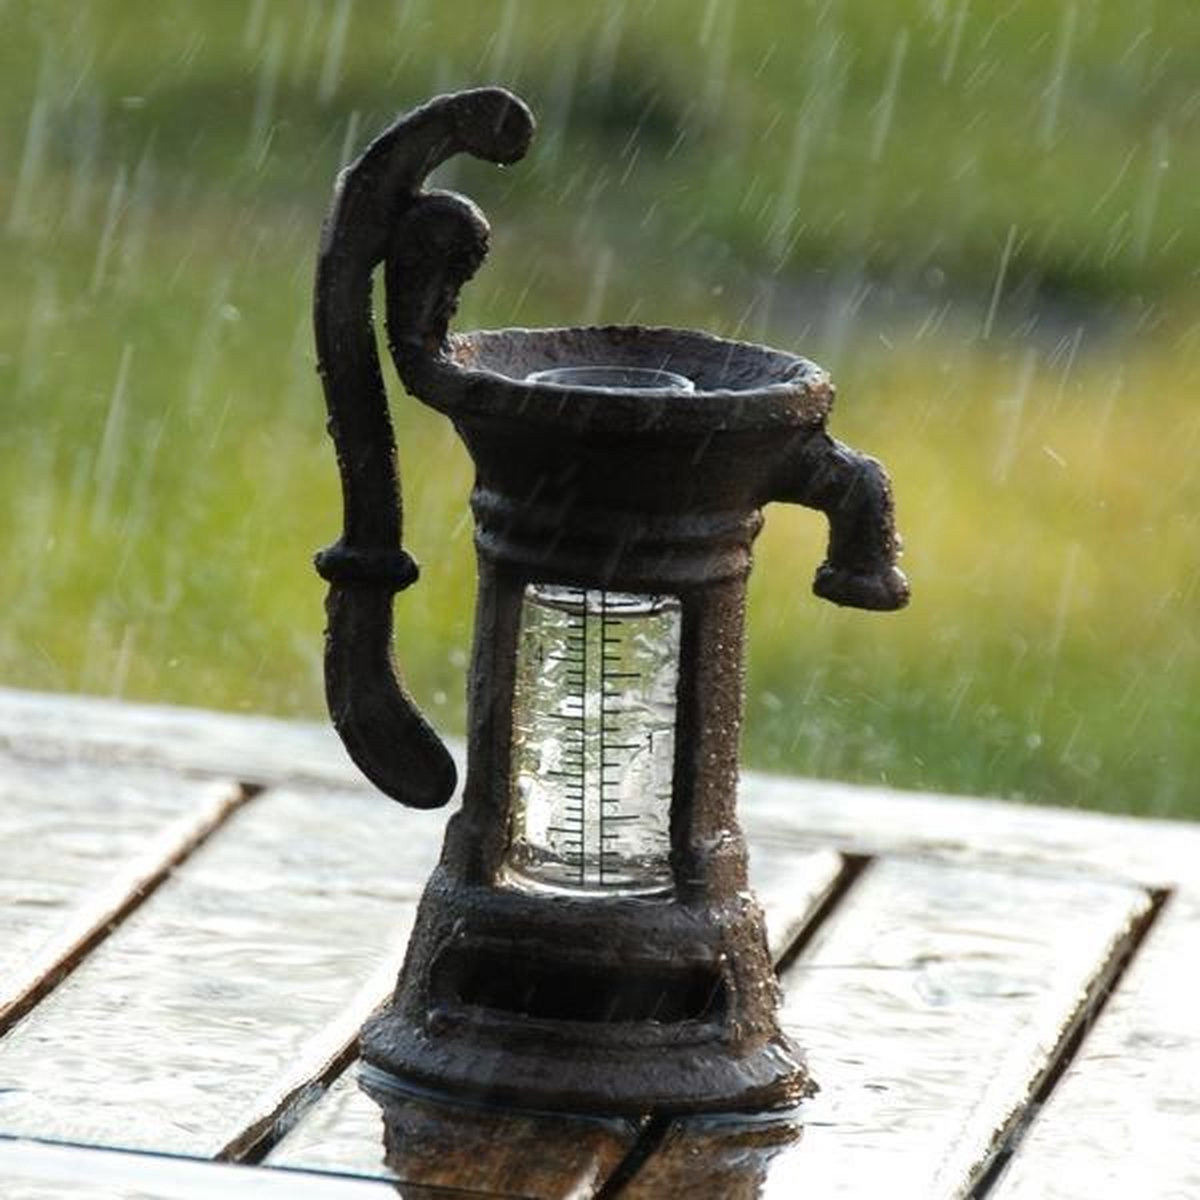 Regenmeter - pluviometer waterpomp - Merkloos